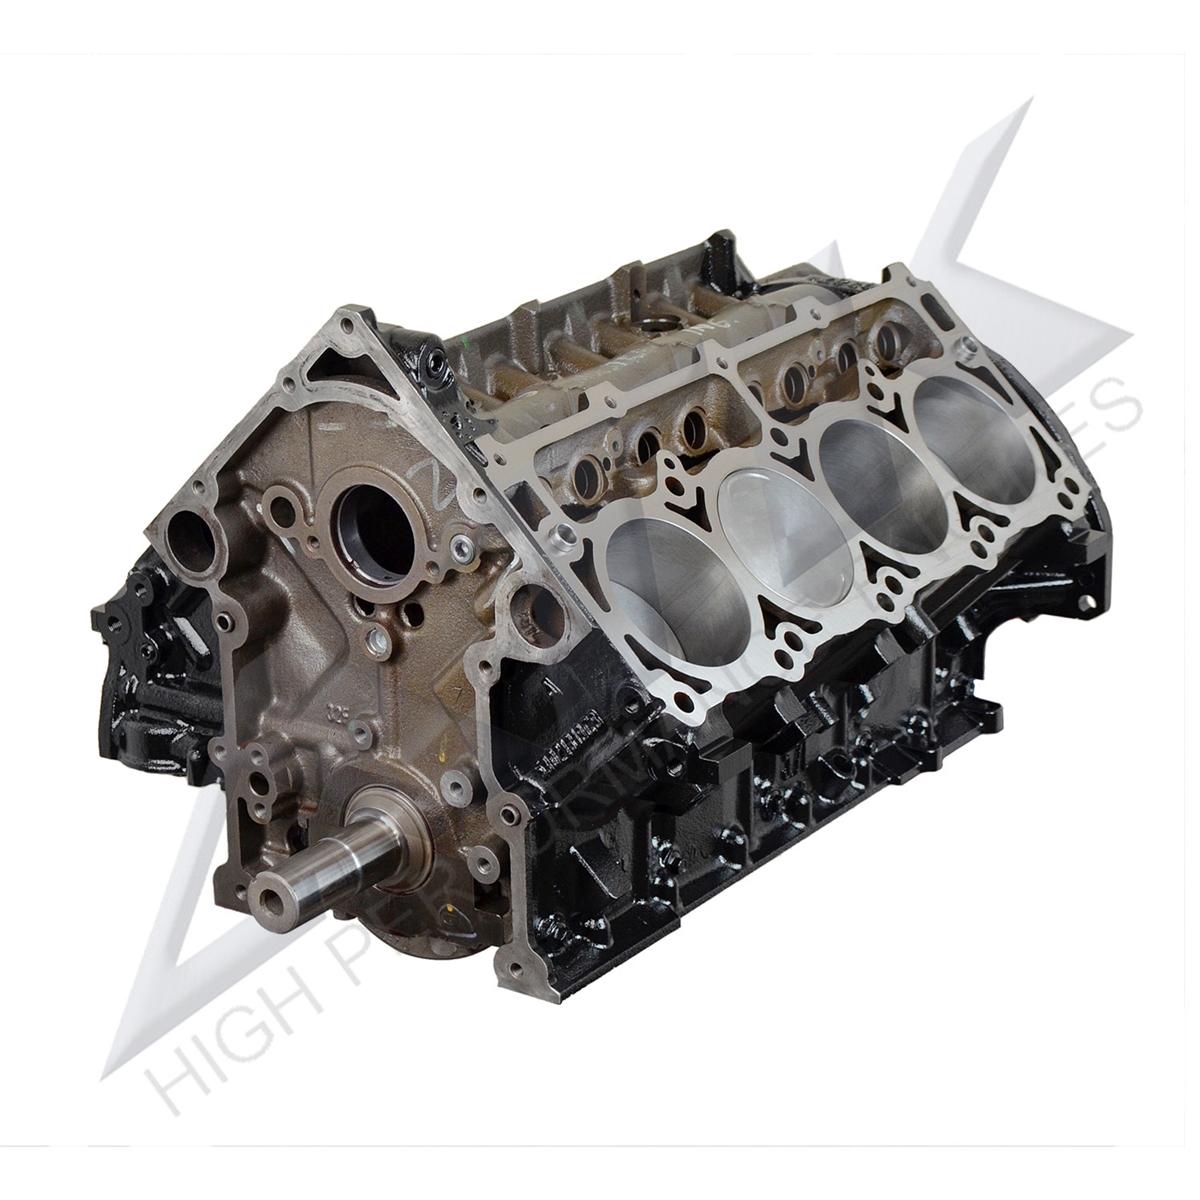 Atk sp97 gen iii hemi 392ci stroker short block crate engine alternative views malvernweather Choice Image